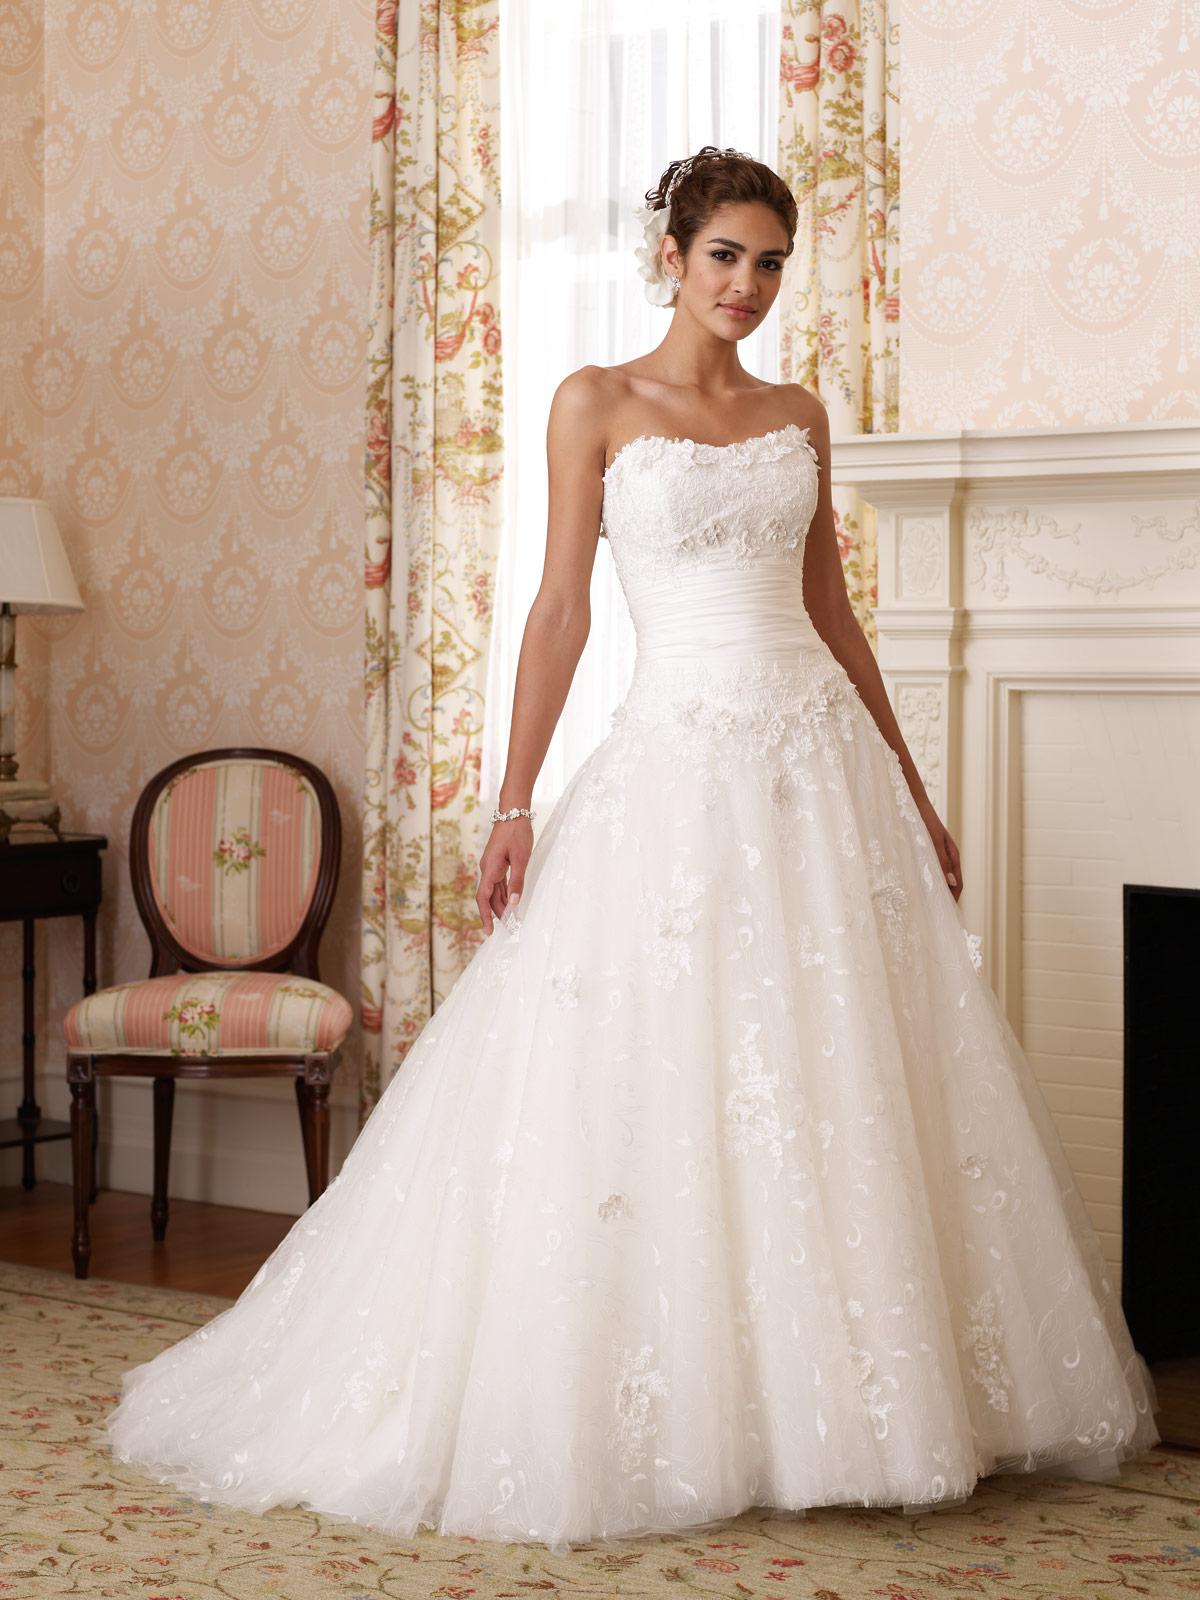 Mon Cheri Wedding Dress Style 110211 Killian | House of Brides